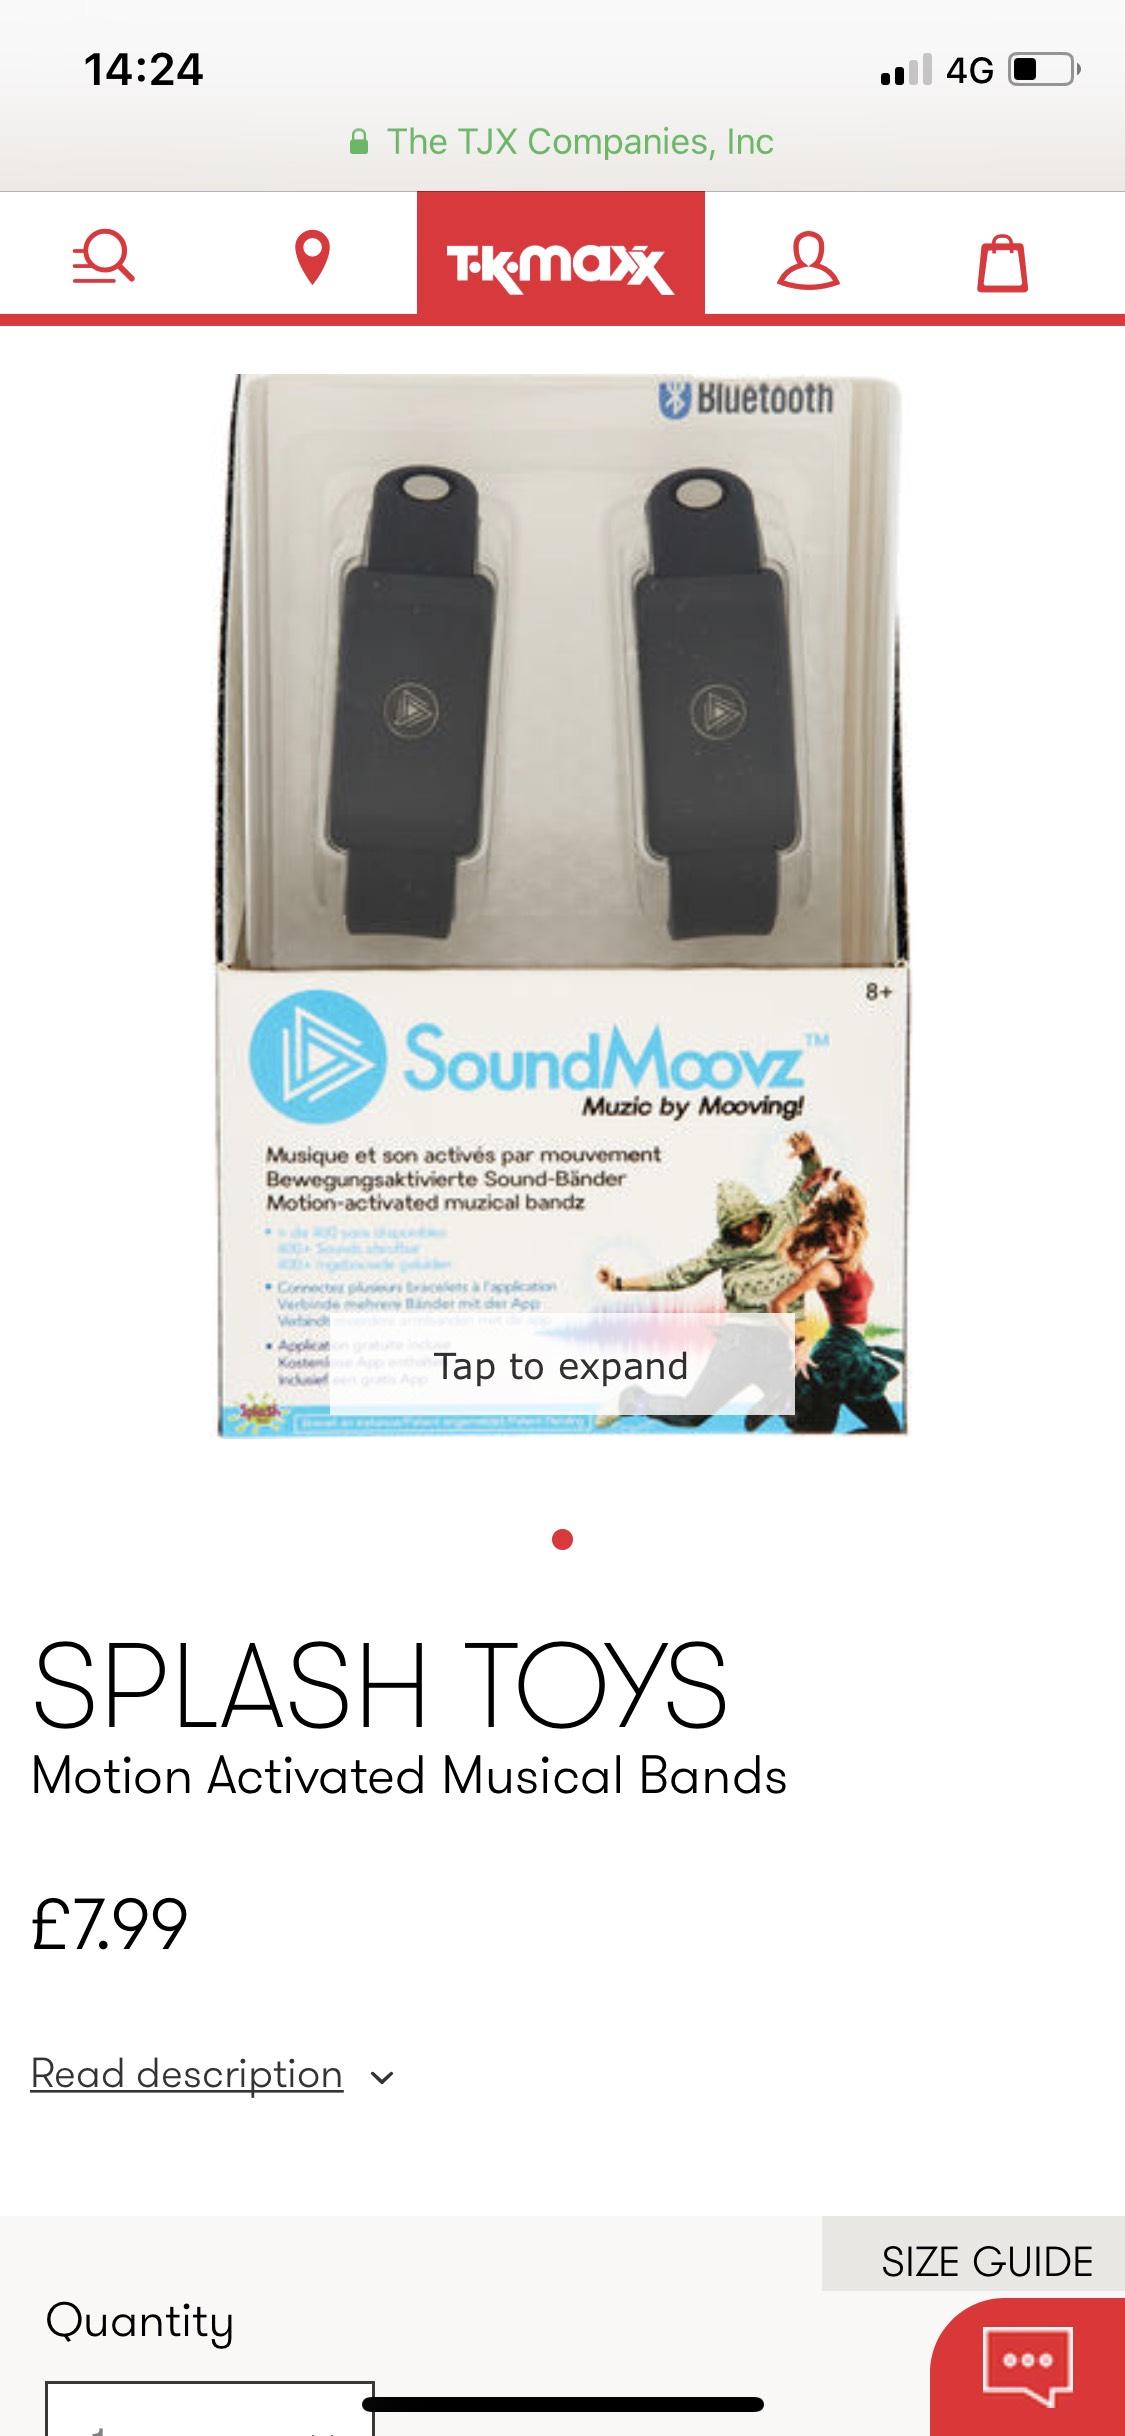 Soundmoovz musical bands £7.99 tkmaxx instore / online